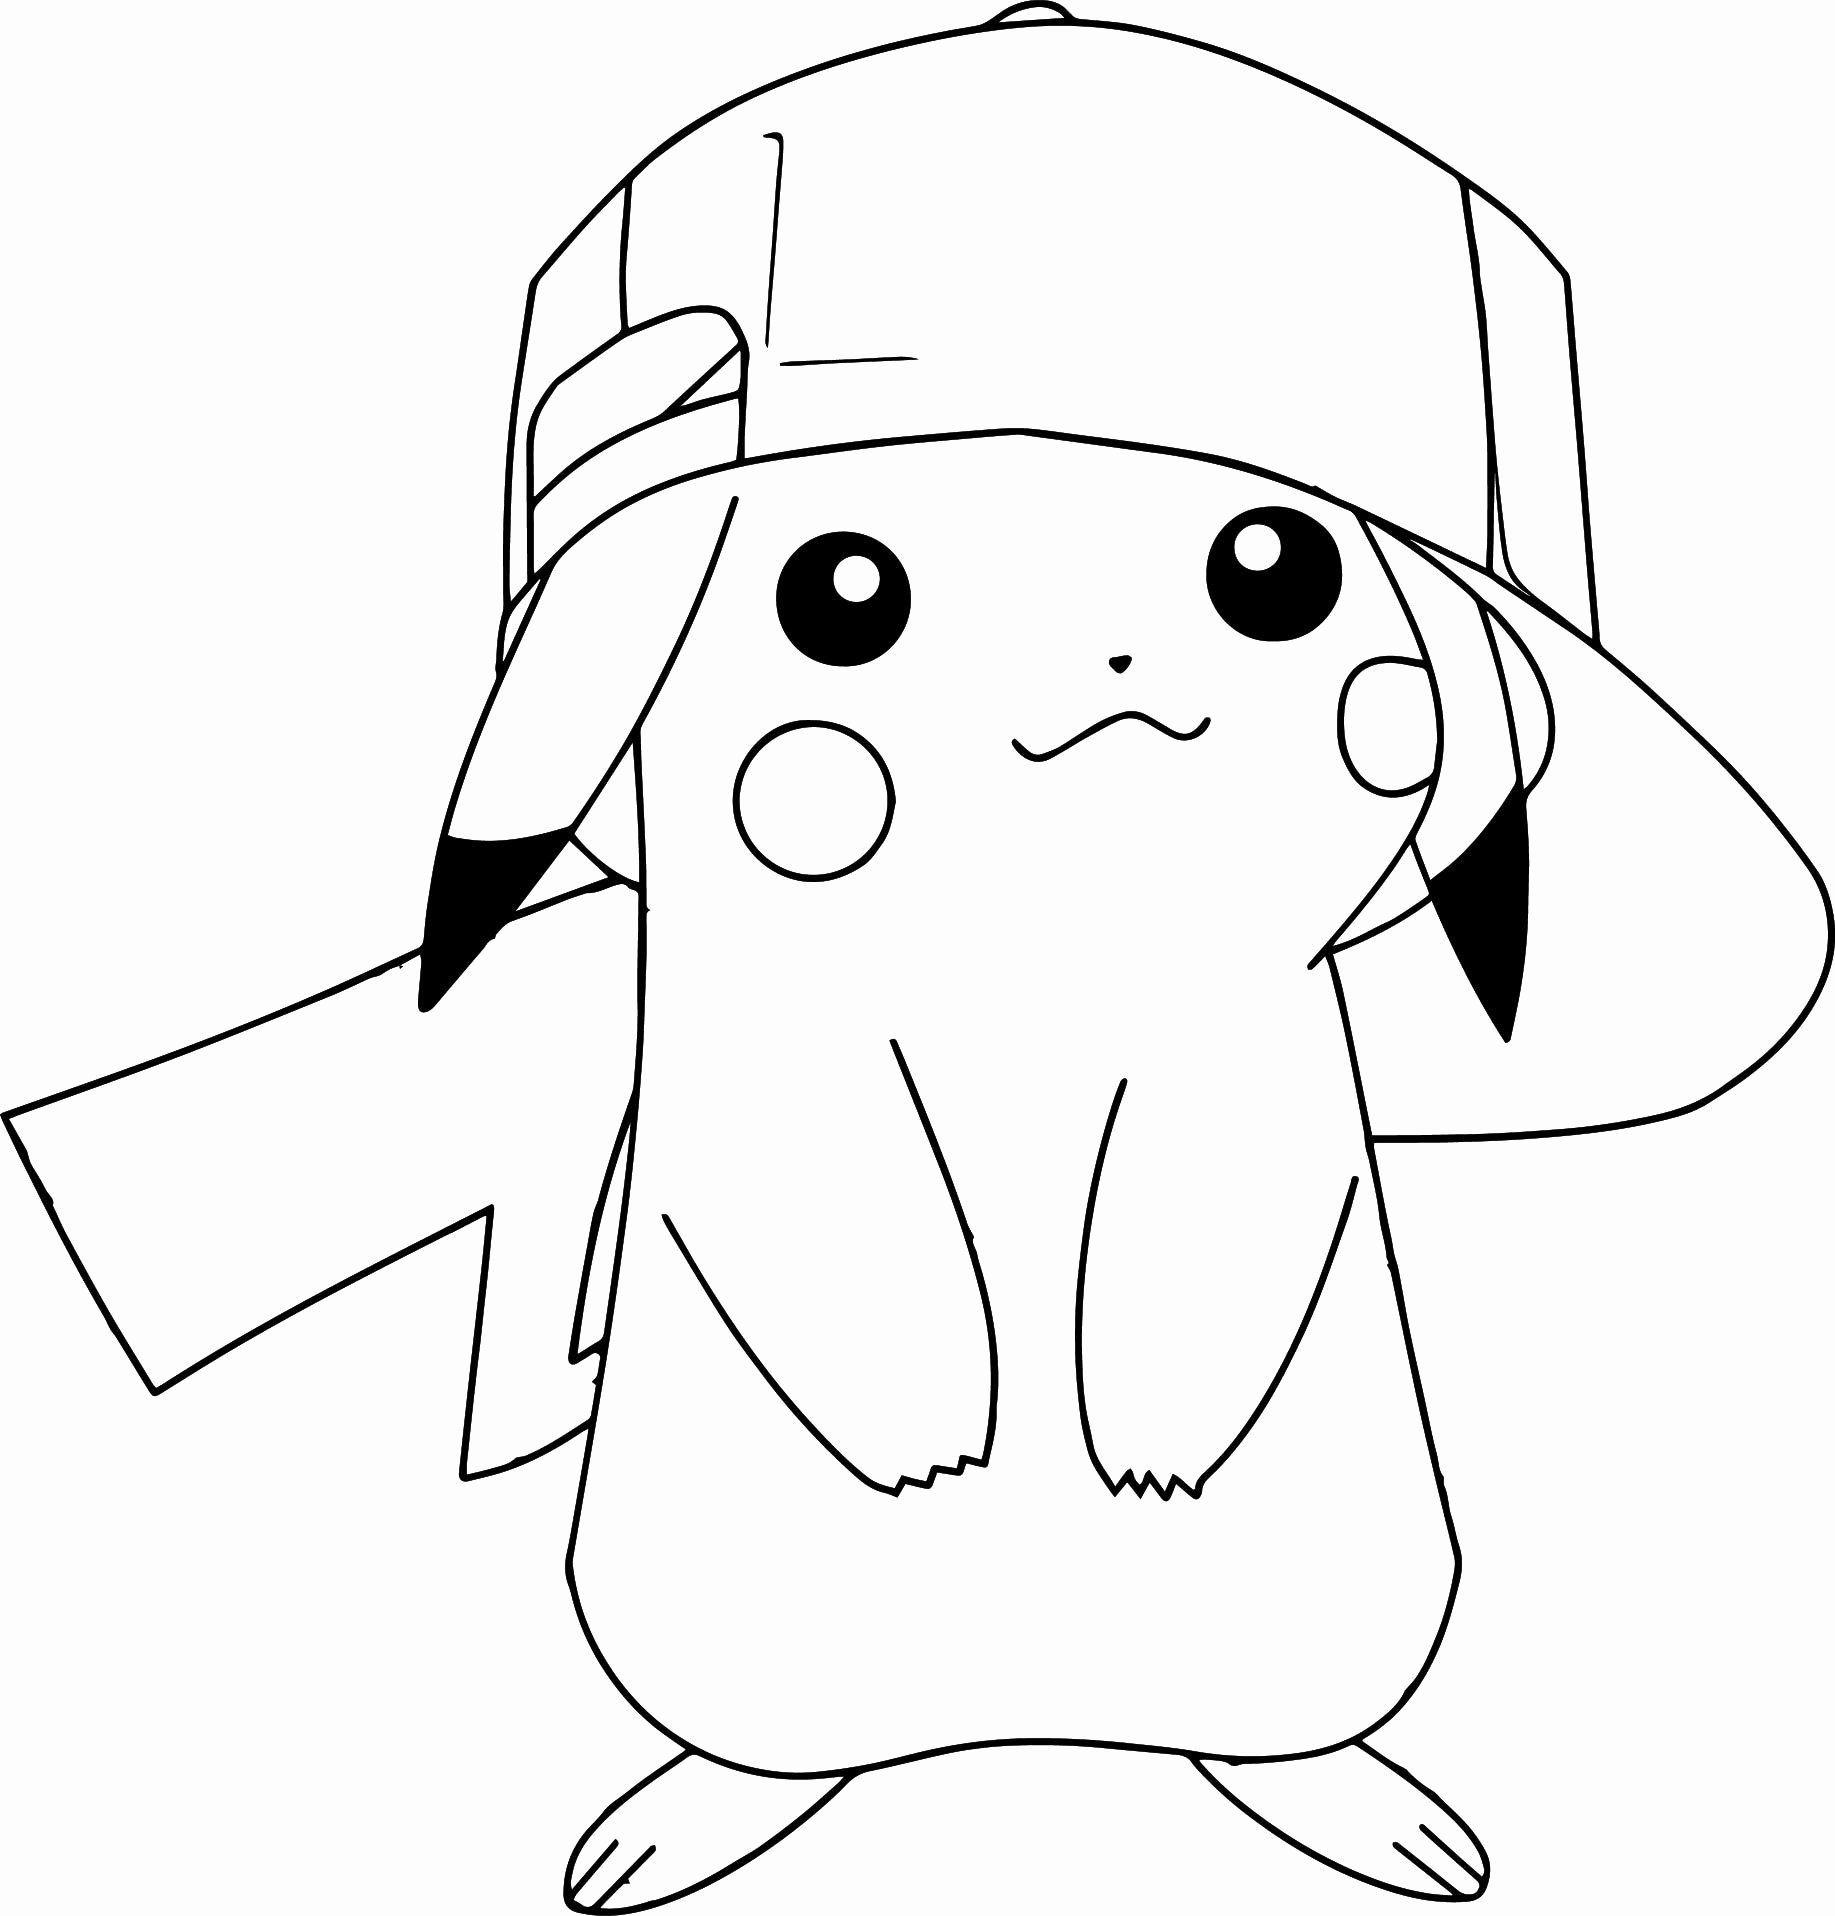 Pokemon Coloring Pages Printable New Perfect Pokemon Coloring Pages Lol Pinterest Di 2020 Pokemon Buku Mewarnai Pikachu